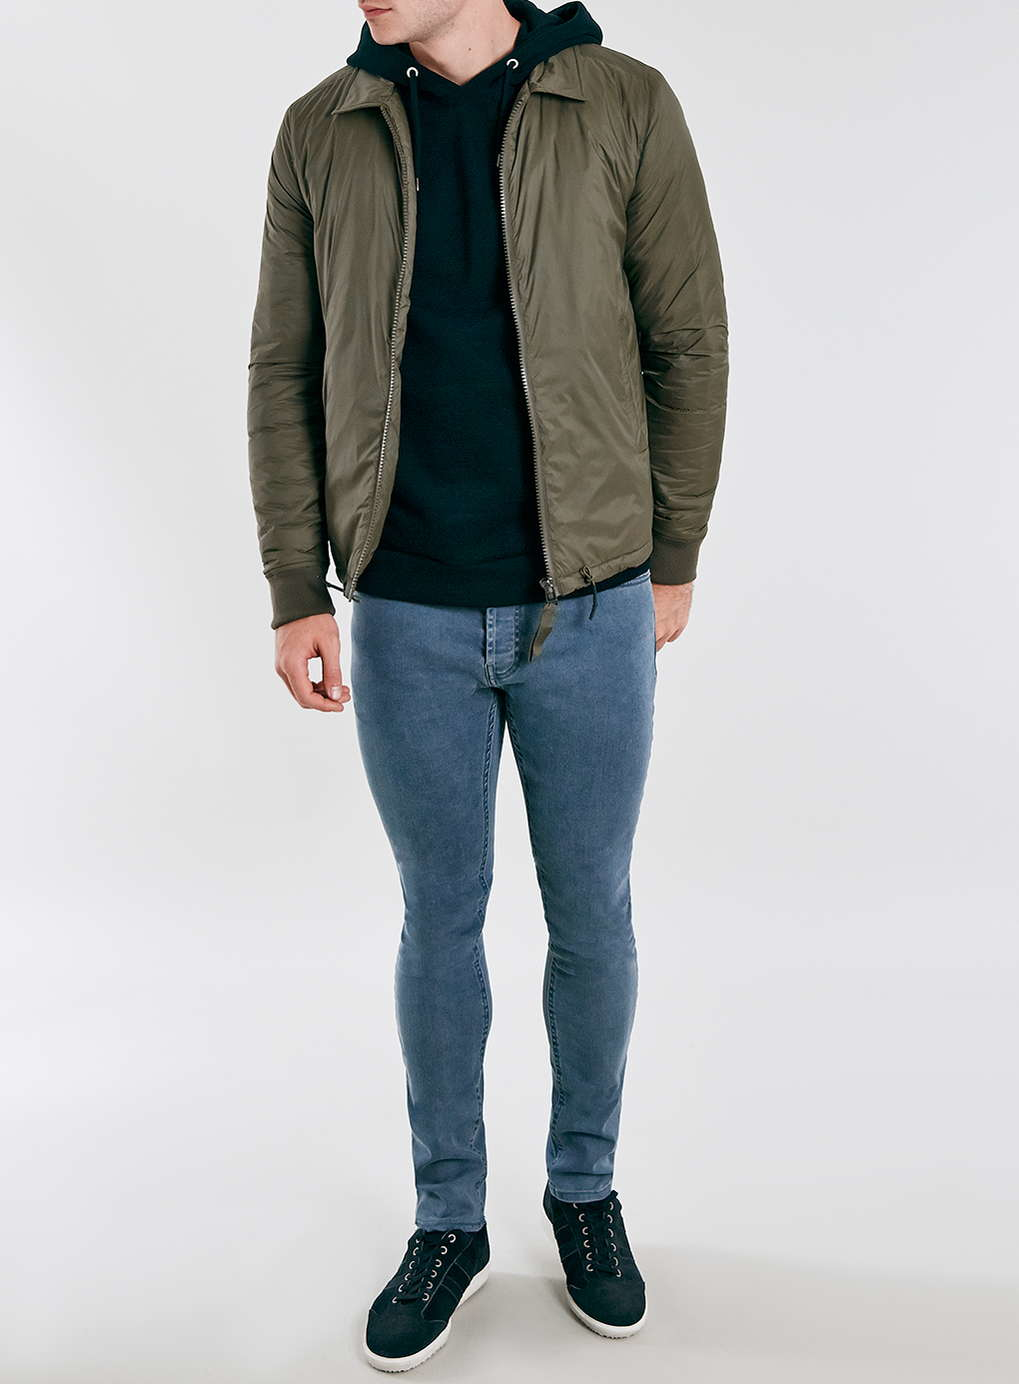 Topman usa - mens fashion - mens clothing - topman